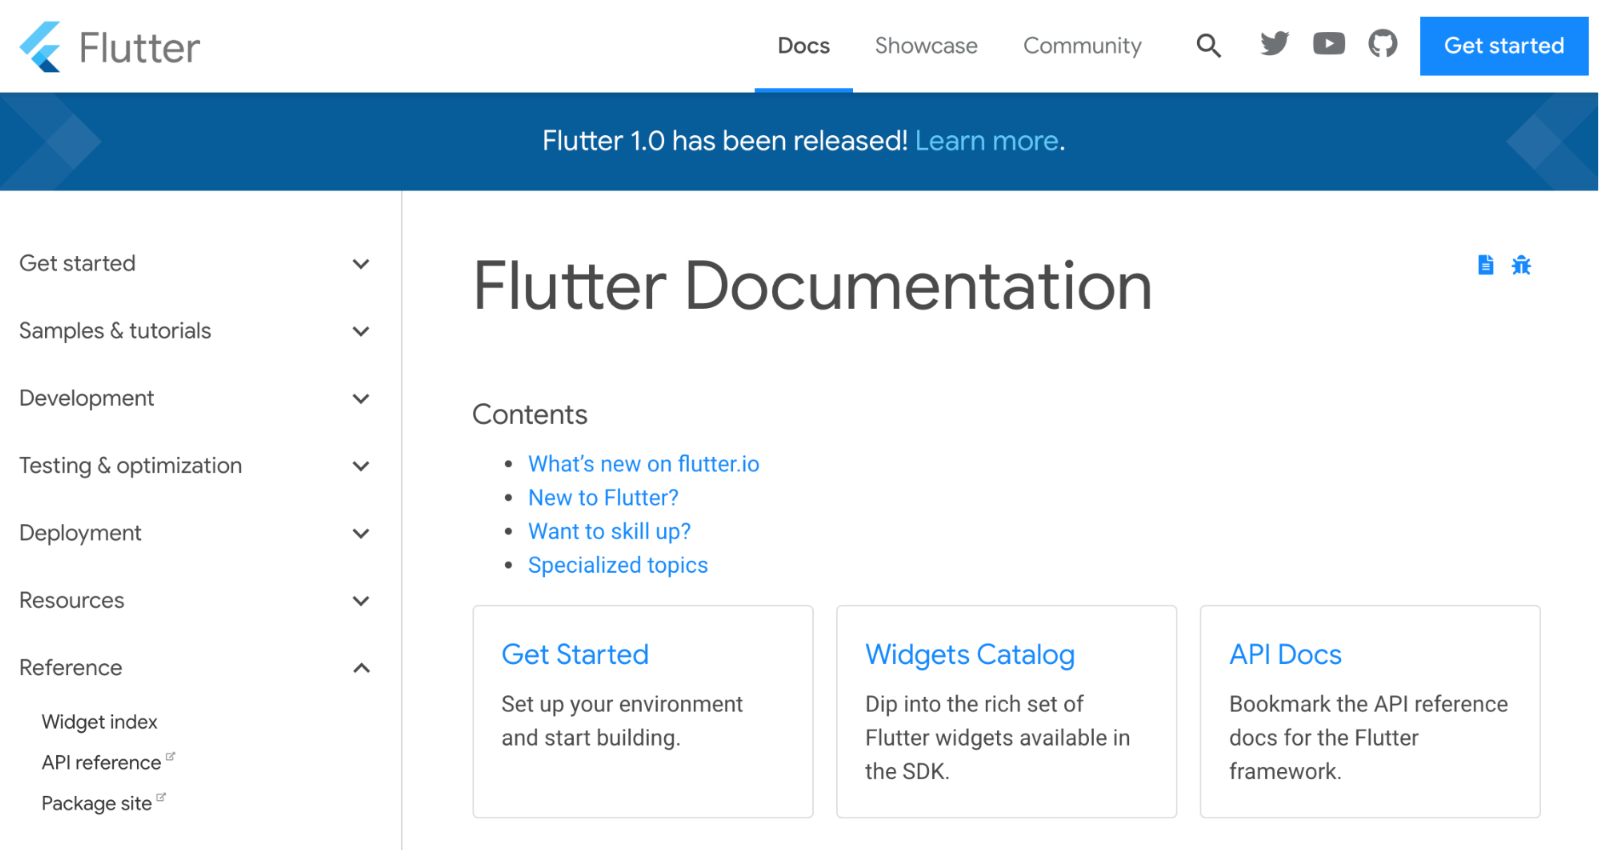 documentation_-_flutter.png__1600x850_q85_crop_subsampling-2_upscale